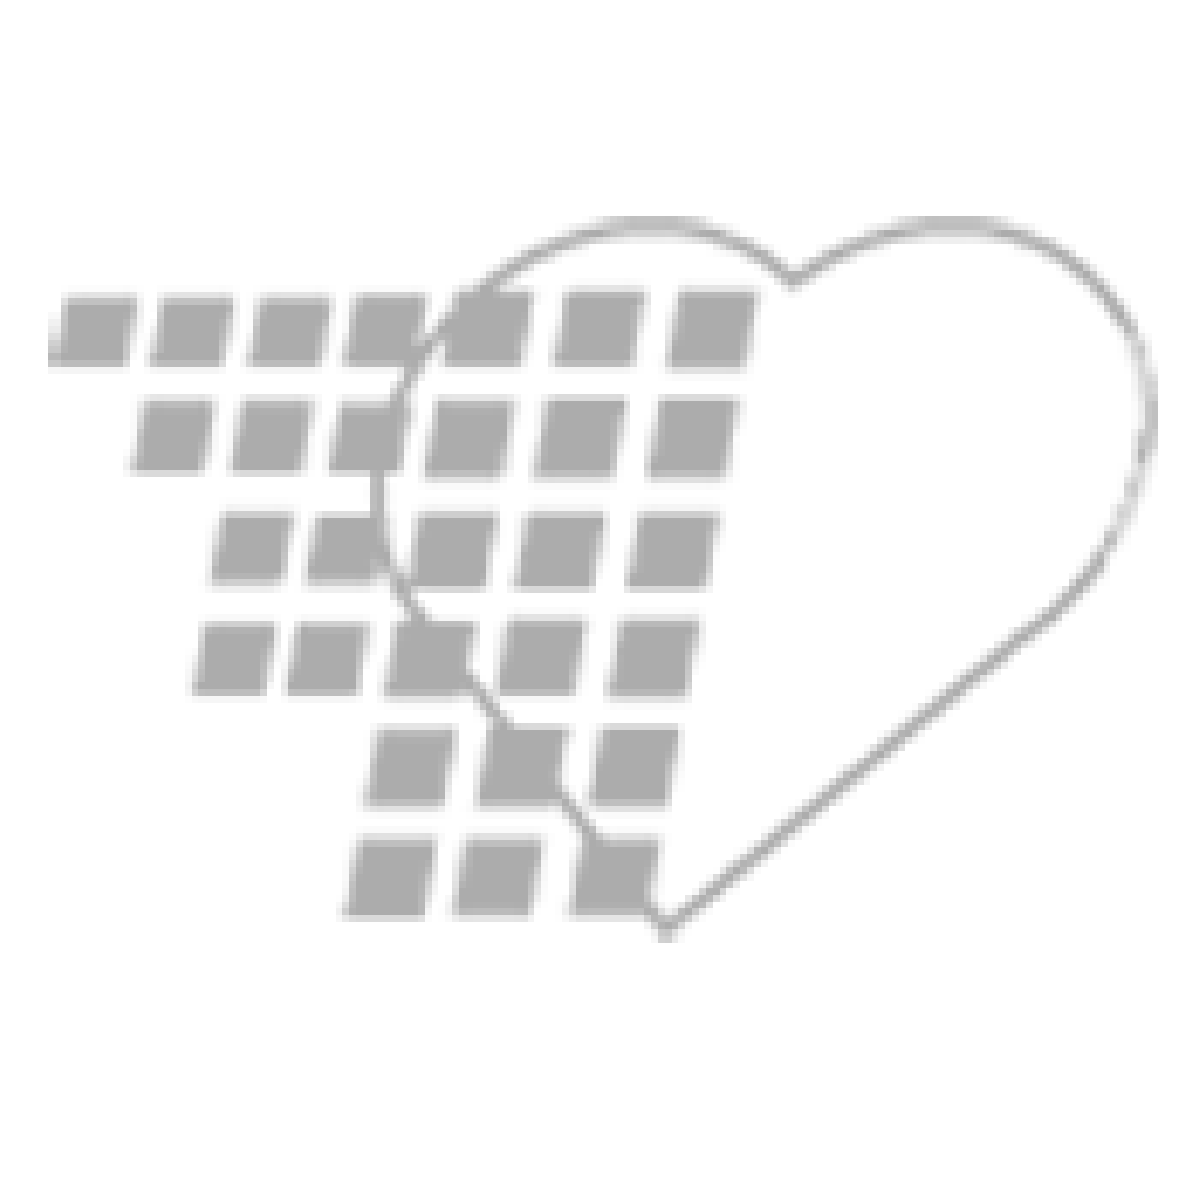 06-93-7511 Demo Dose® Dilaudd Vial/IV Kit